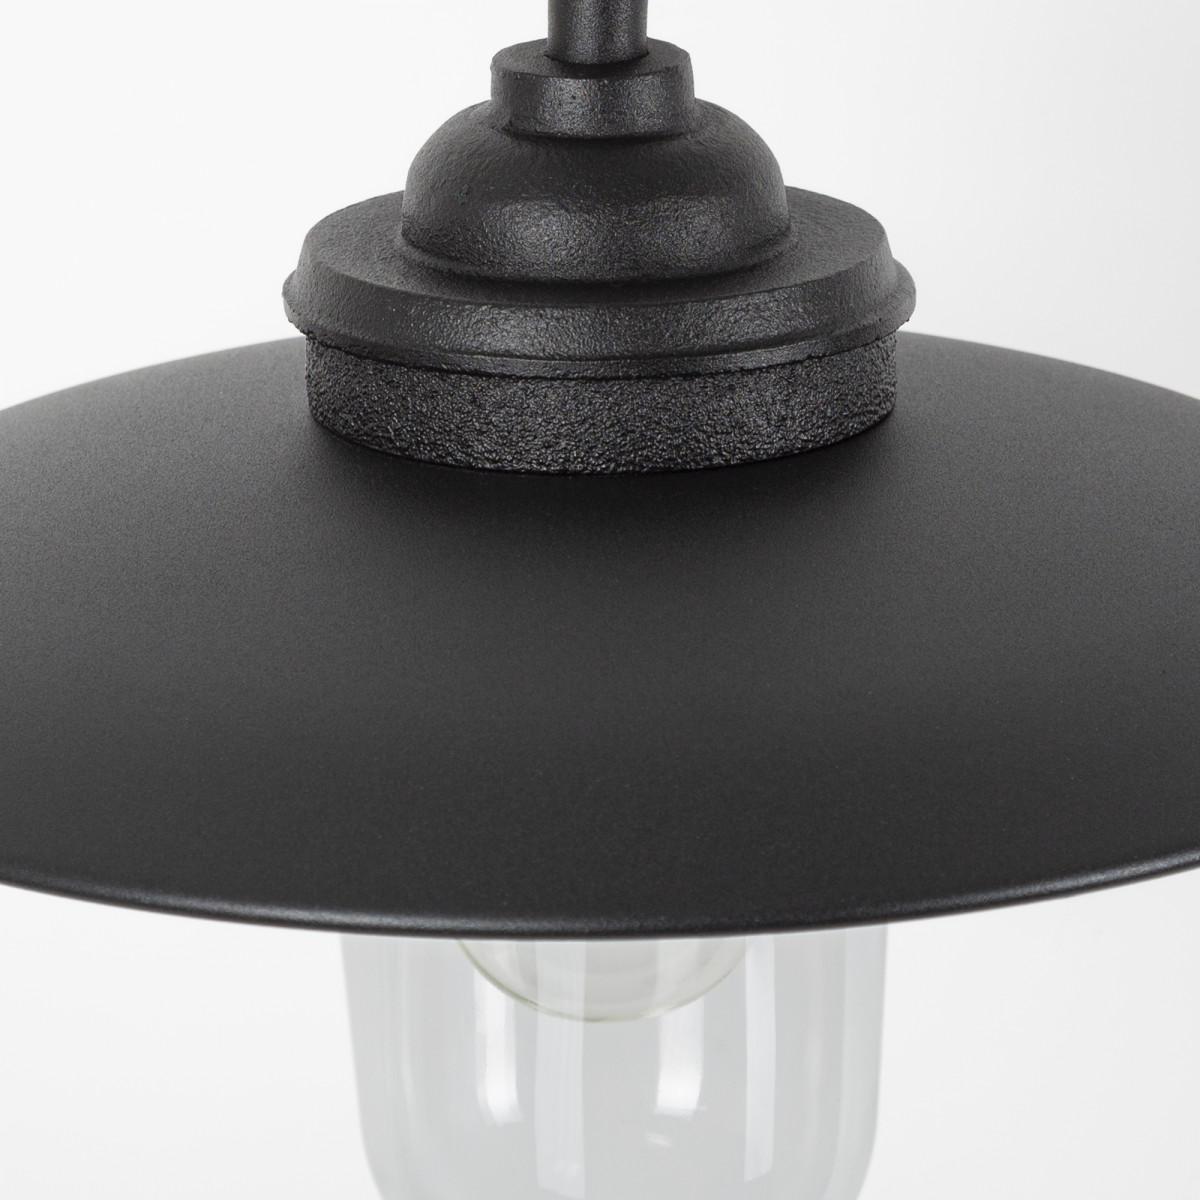 Stoere Gietijzeren Stallamp Provence buitenlamp  Zwart